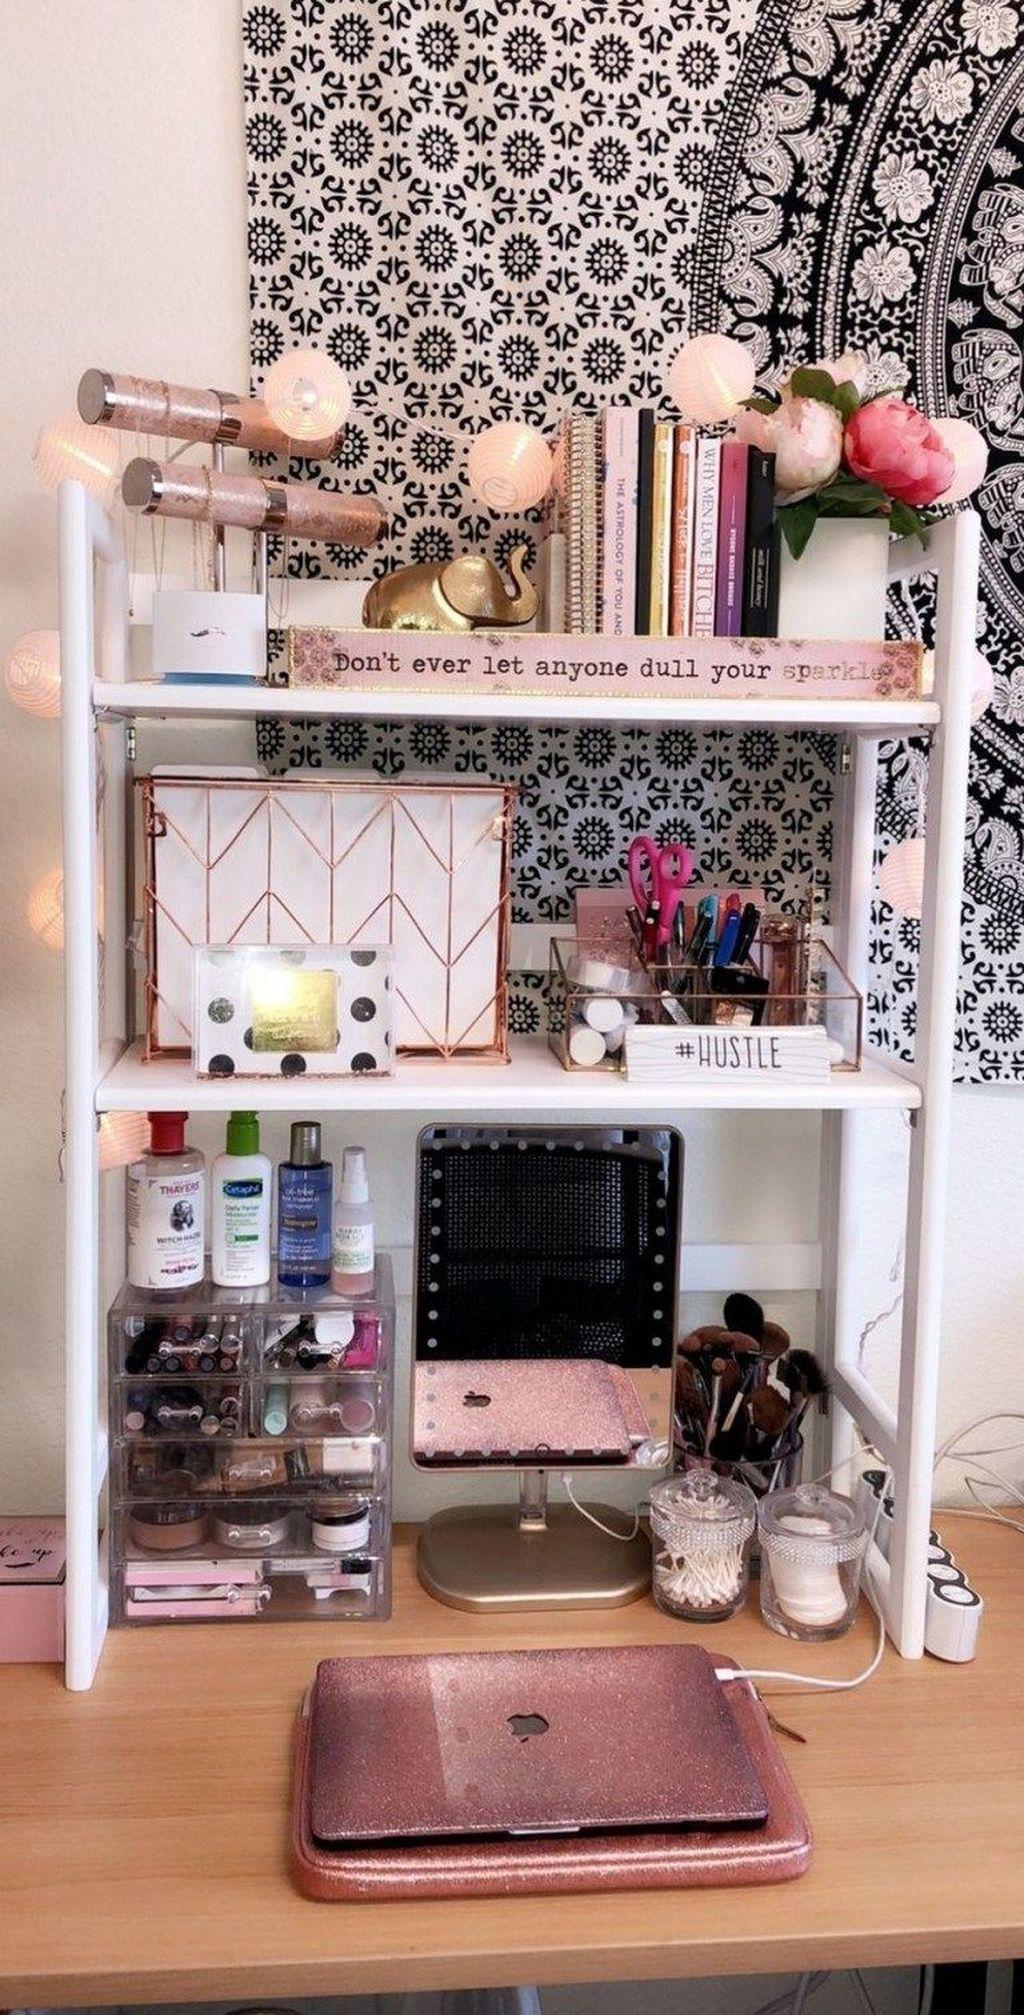 30+ cute dorm room decorating ideas that looks very elegant | elegant dorm room, classy dorm